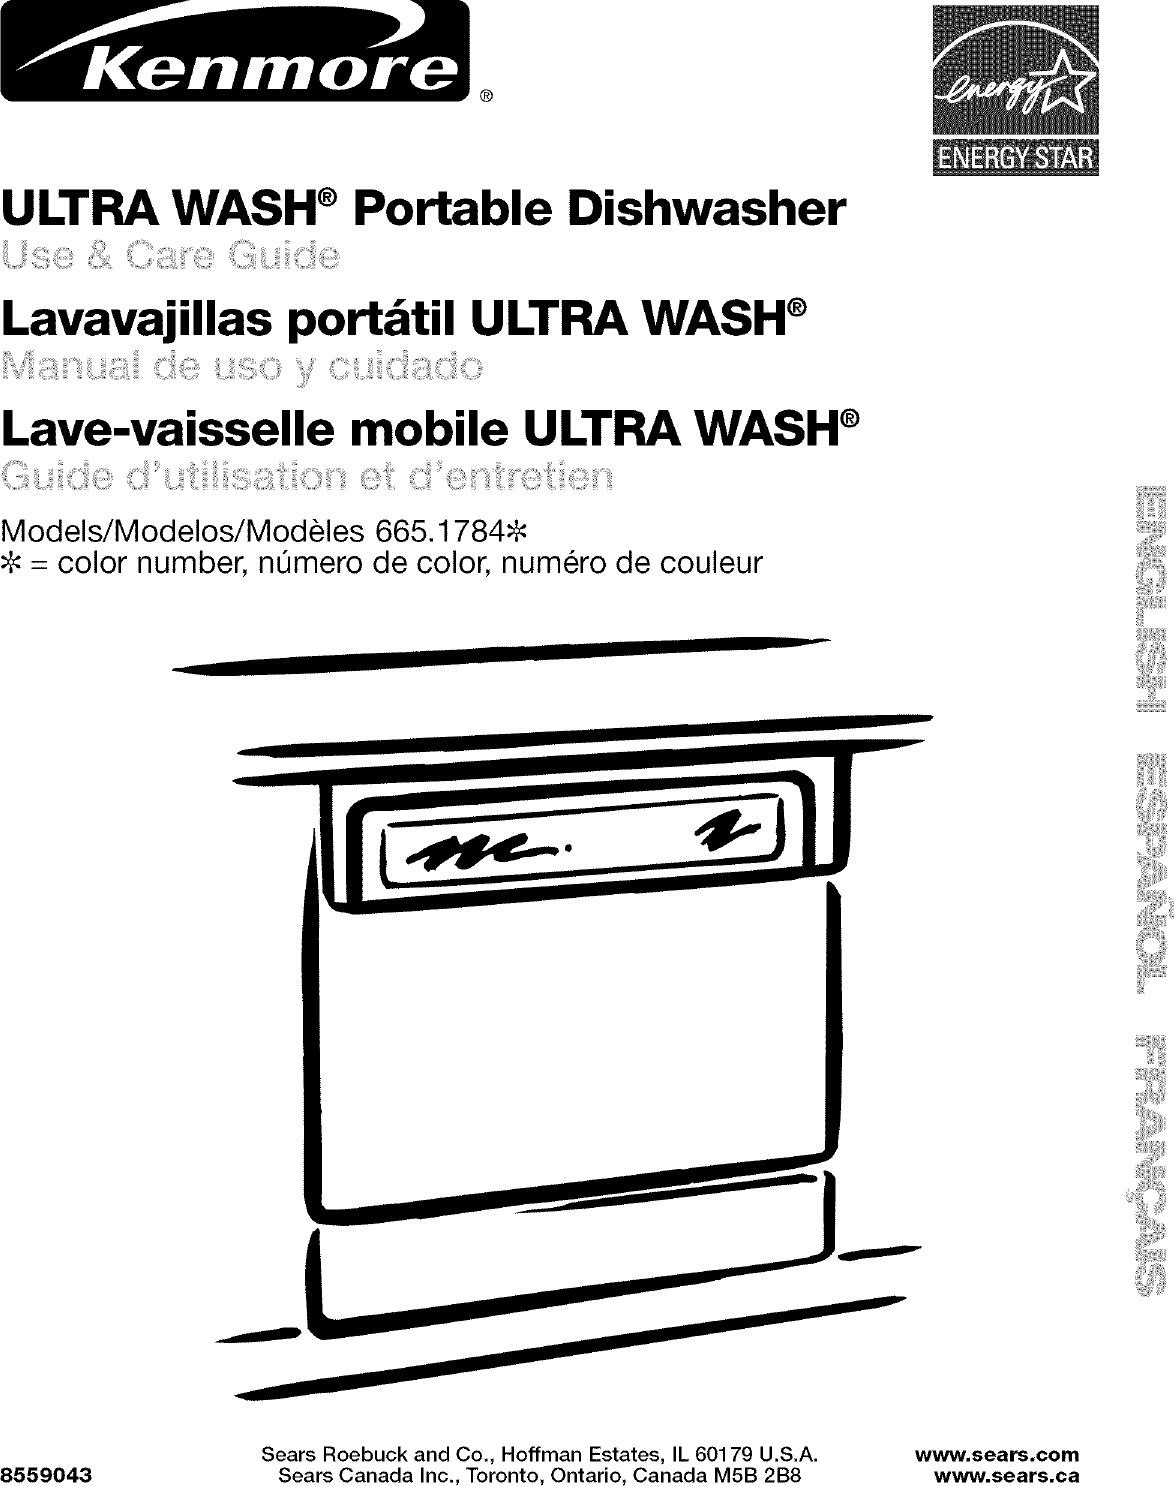 Kenmore User Manual Dishwasher Manuals And